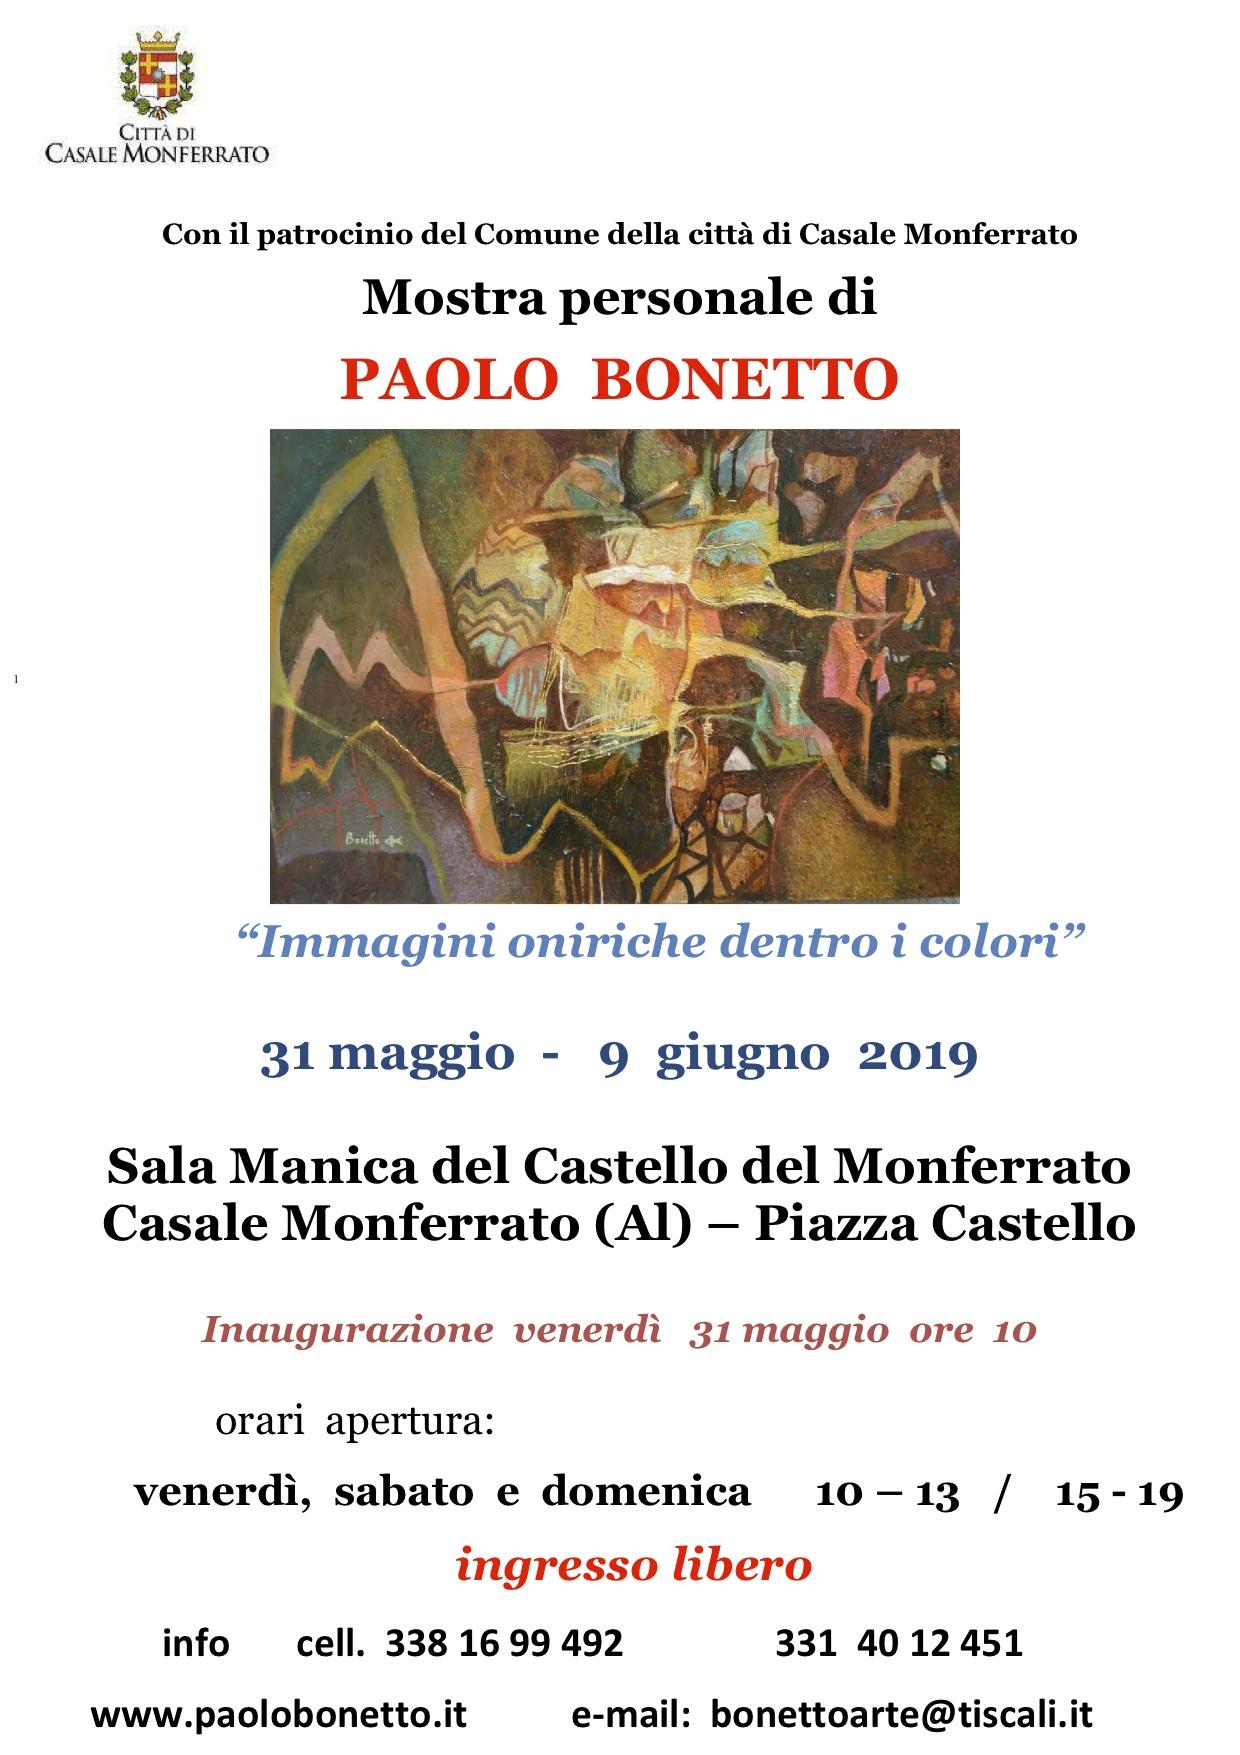 Paolo locandina A4 Casale.jpg